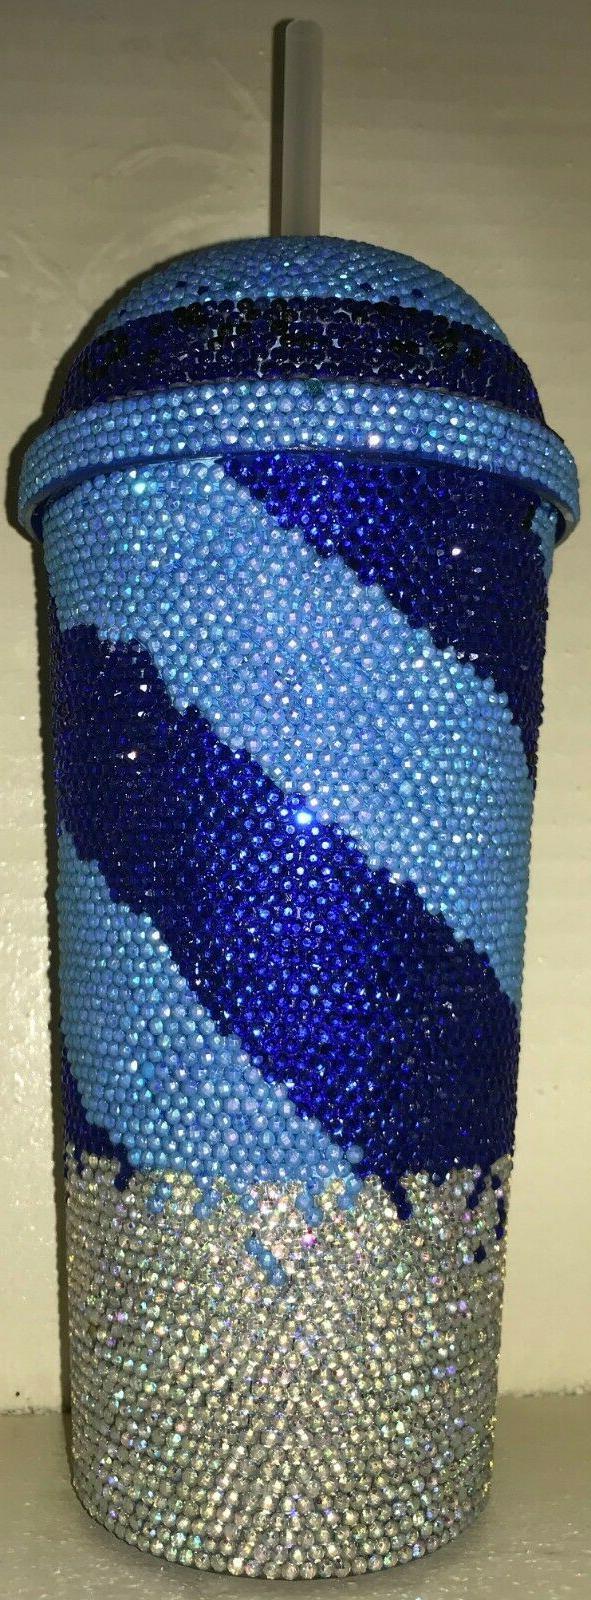 custom bling tumbler drink cup 20 oz